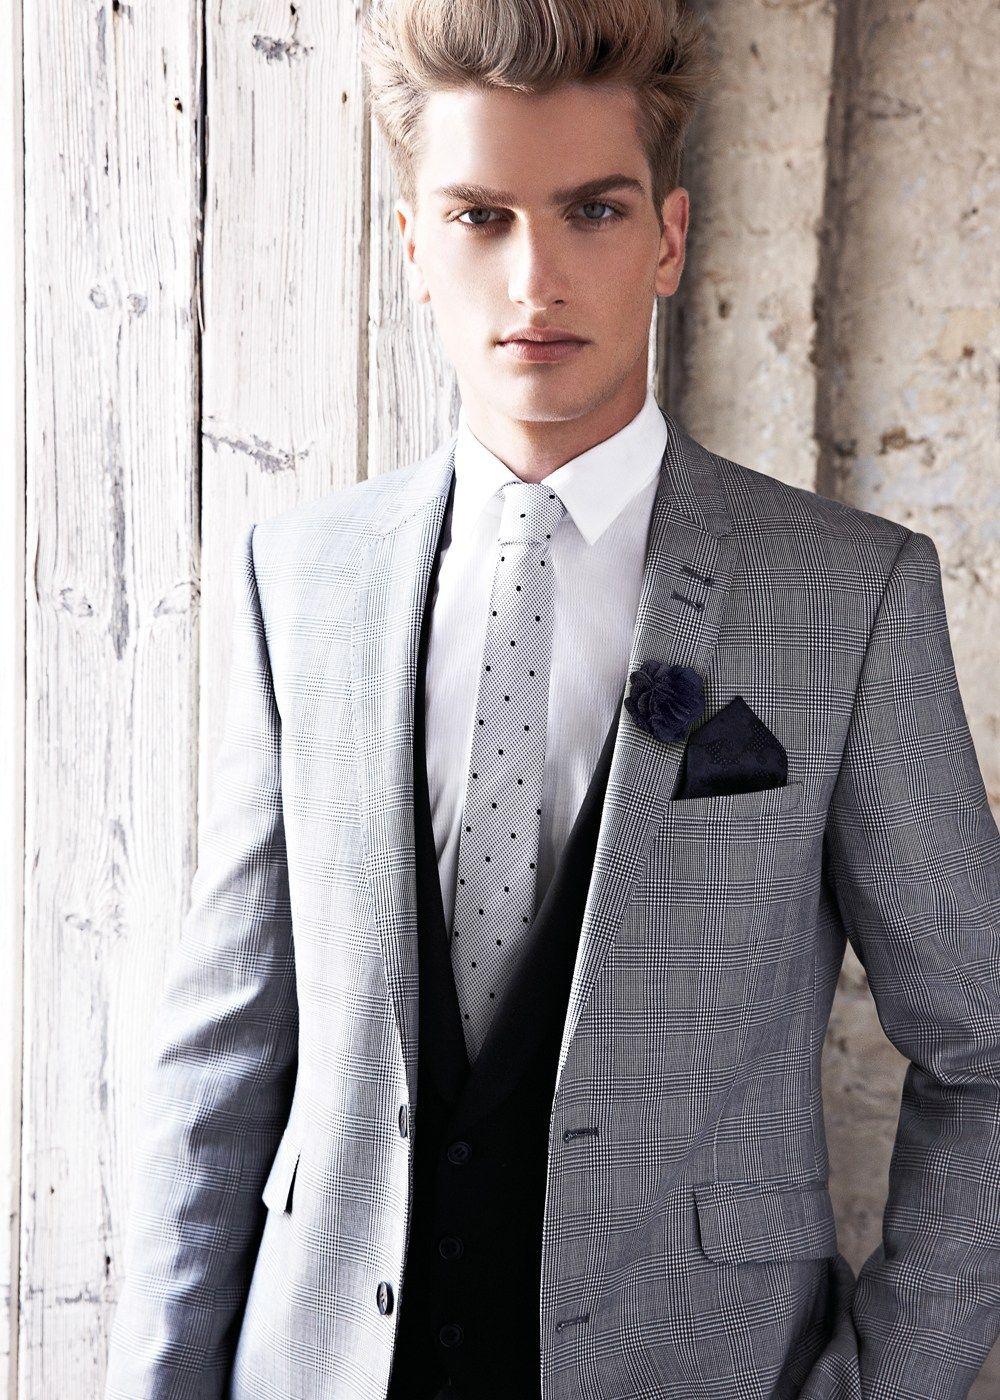 Fein Matalan Wedding Suits Fotos - Brautkleider Ideen ...